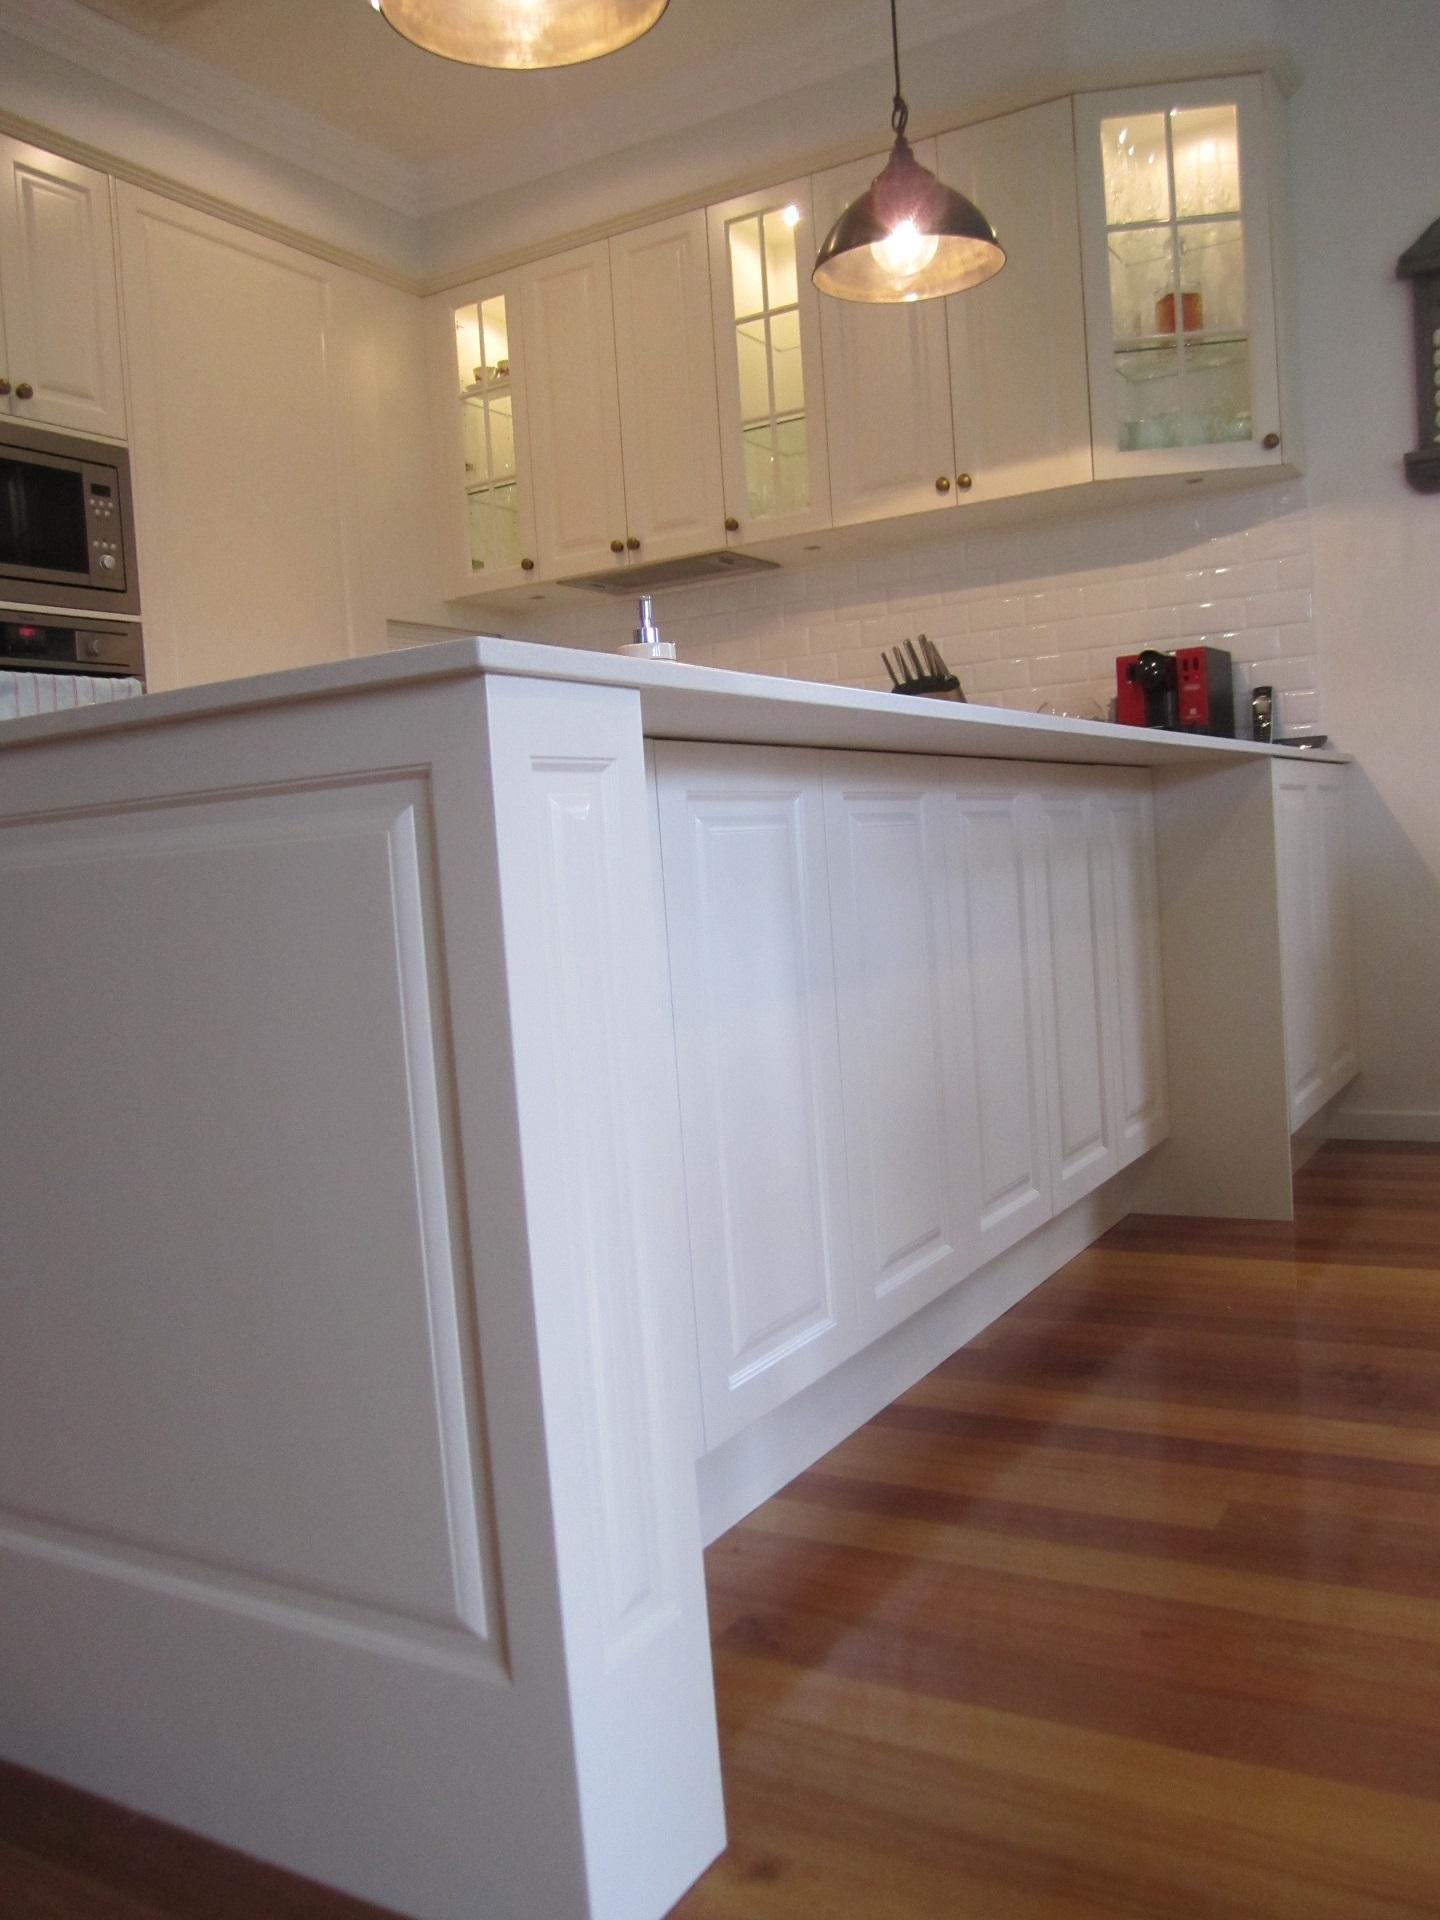 Brisbane Kitchen Design Sydney St Camp Hill Traditional Kitchen Renovation Island Posts8